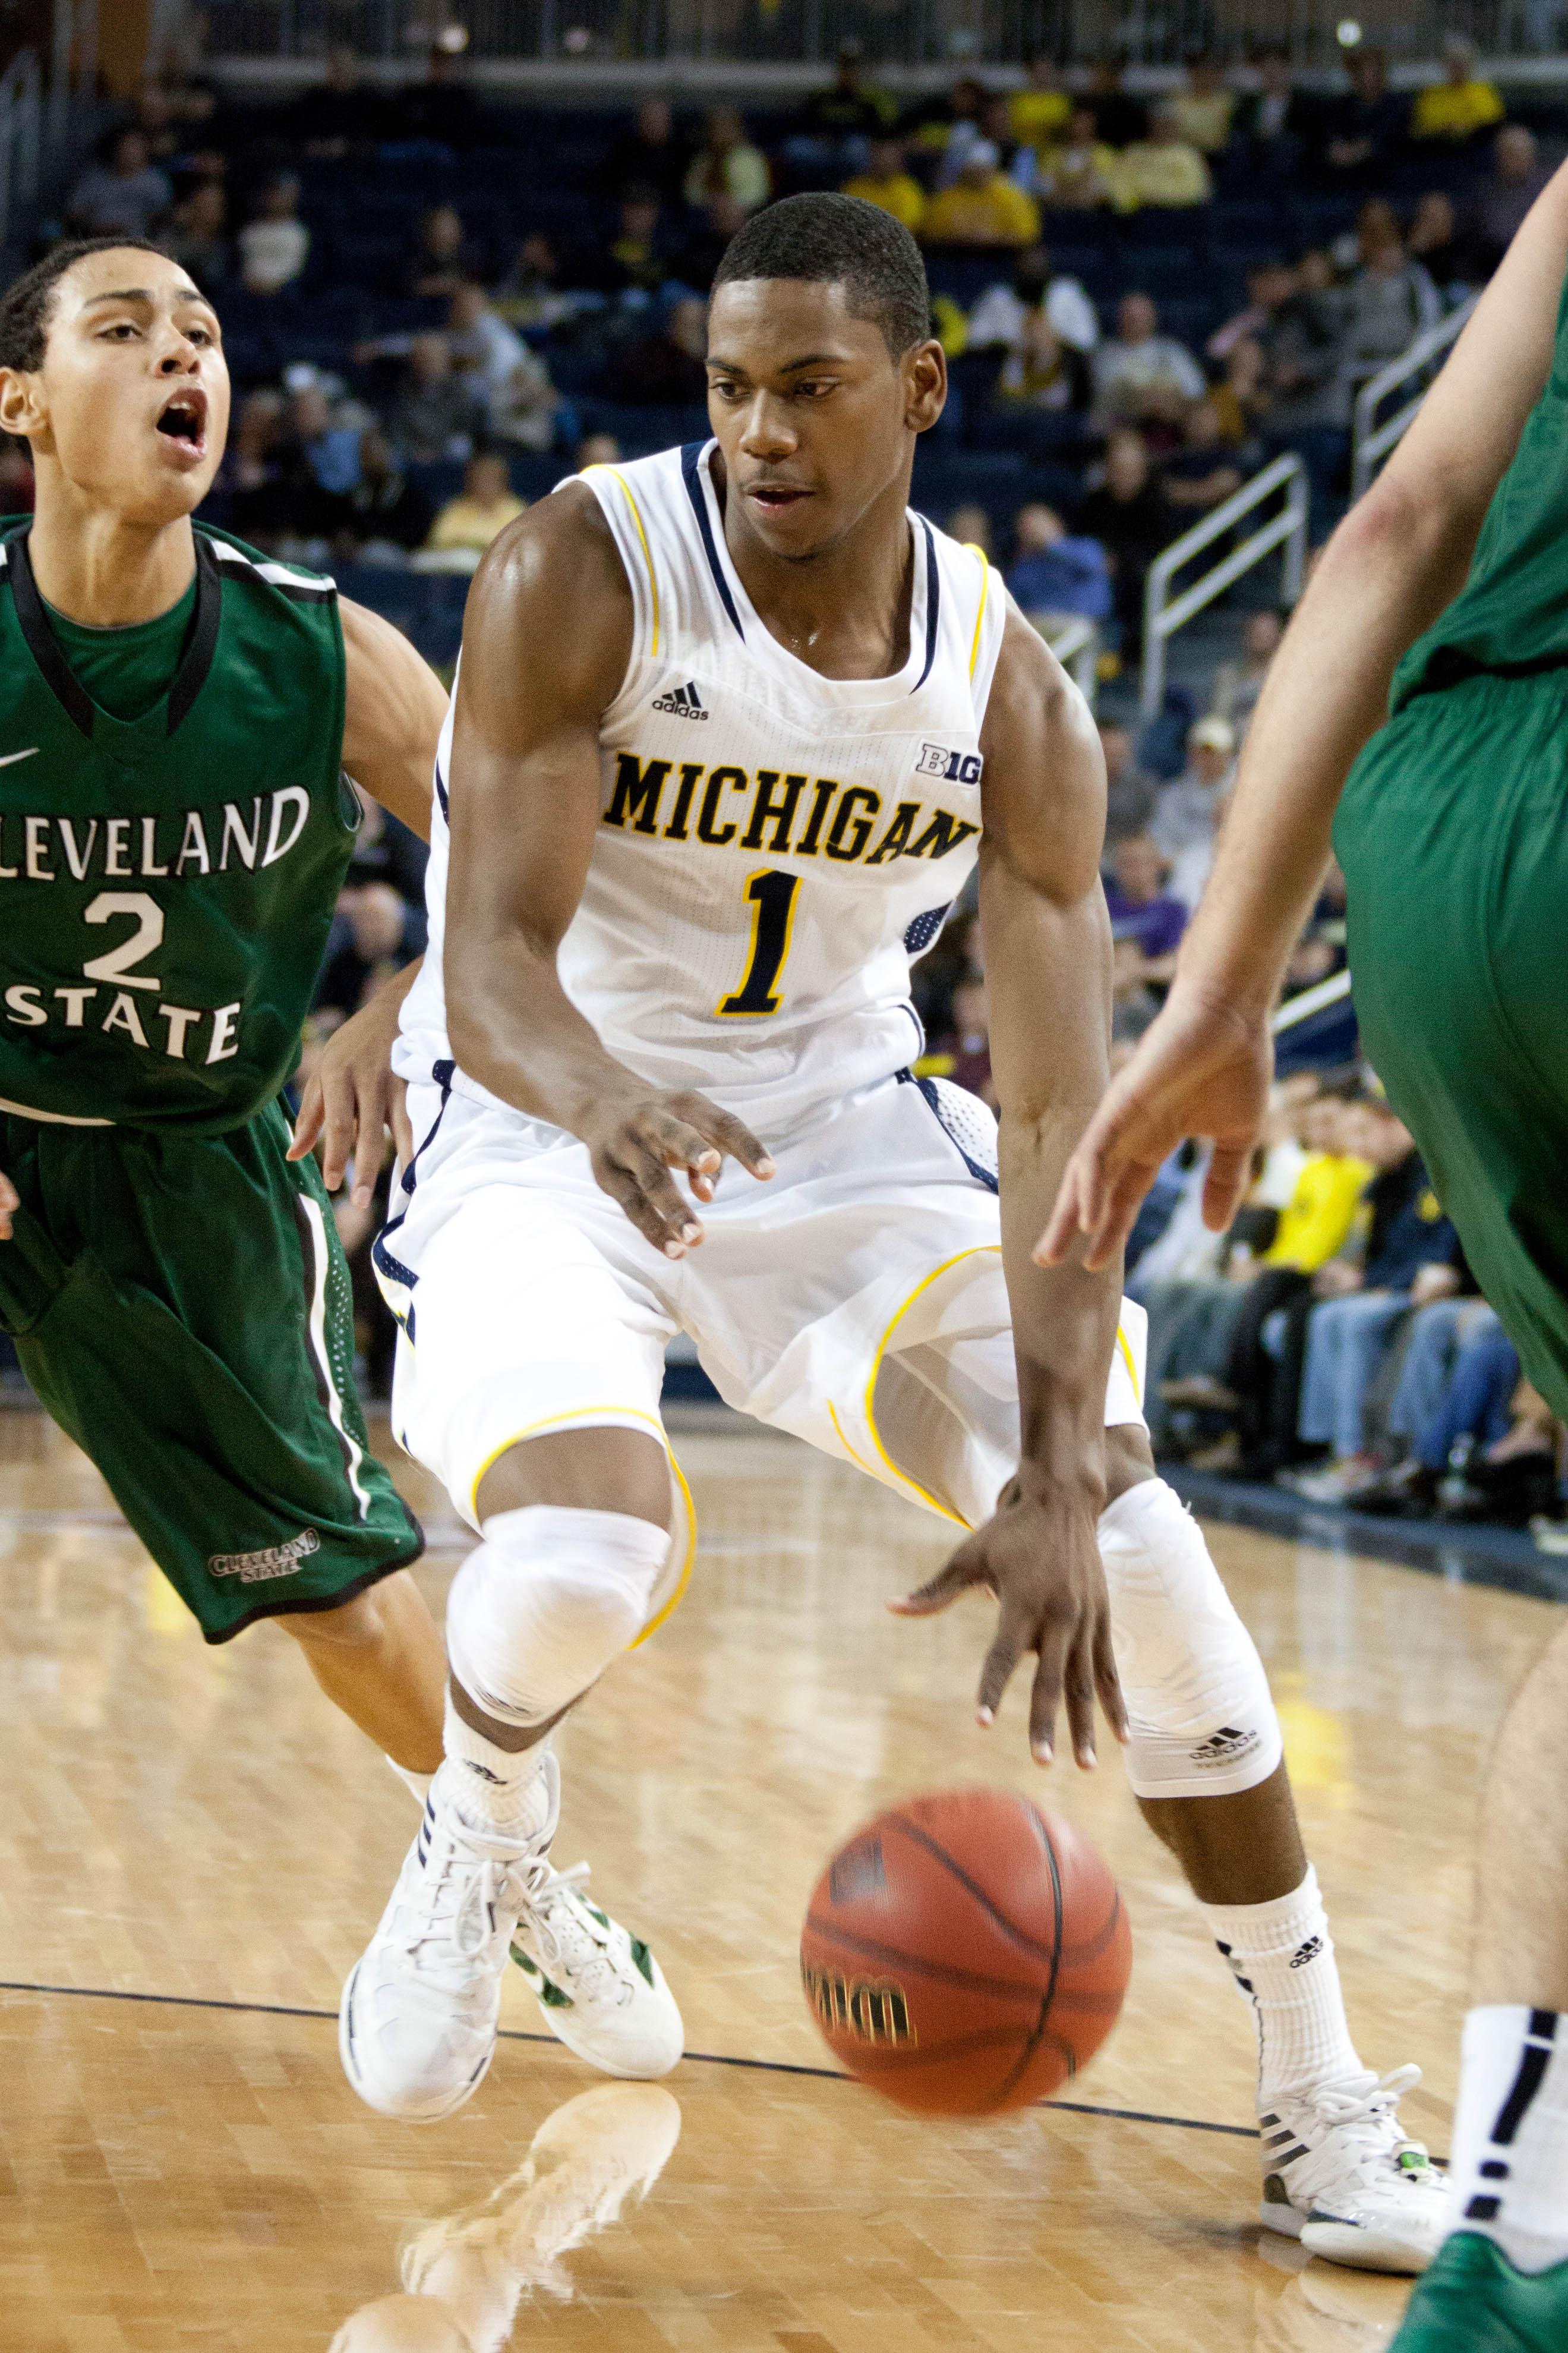 Michigan 77, Cleveland State 47 — 29